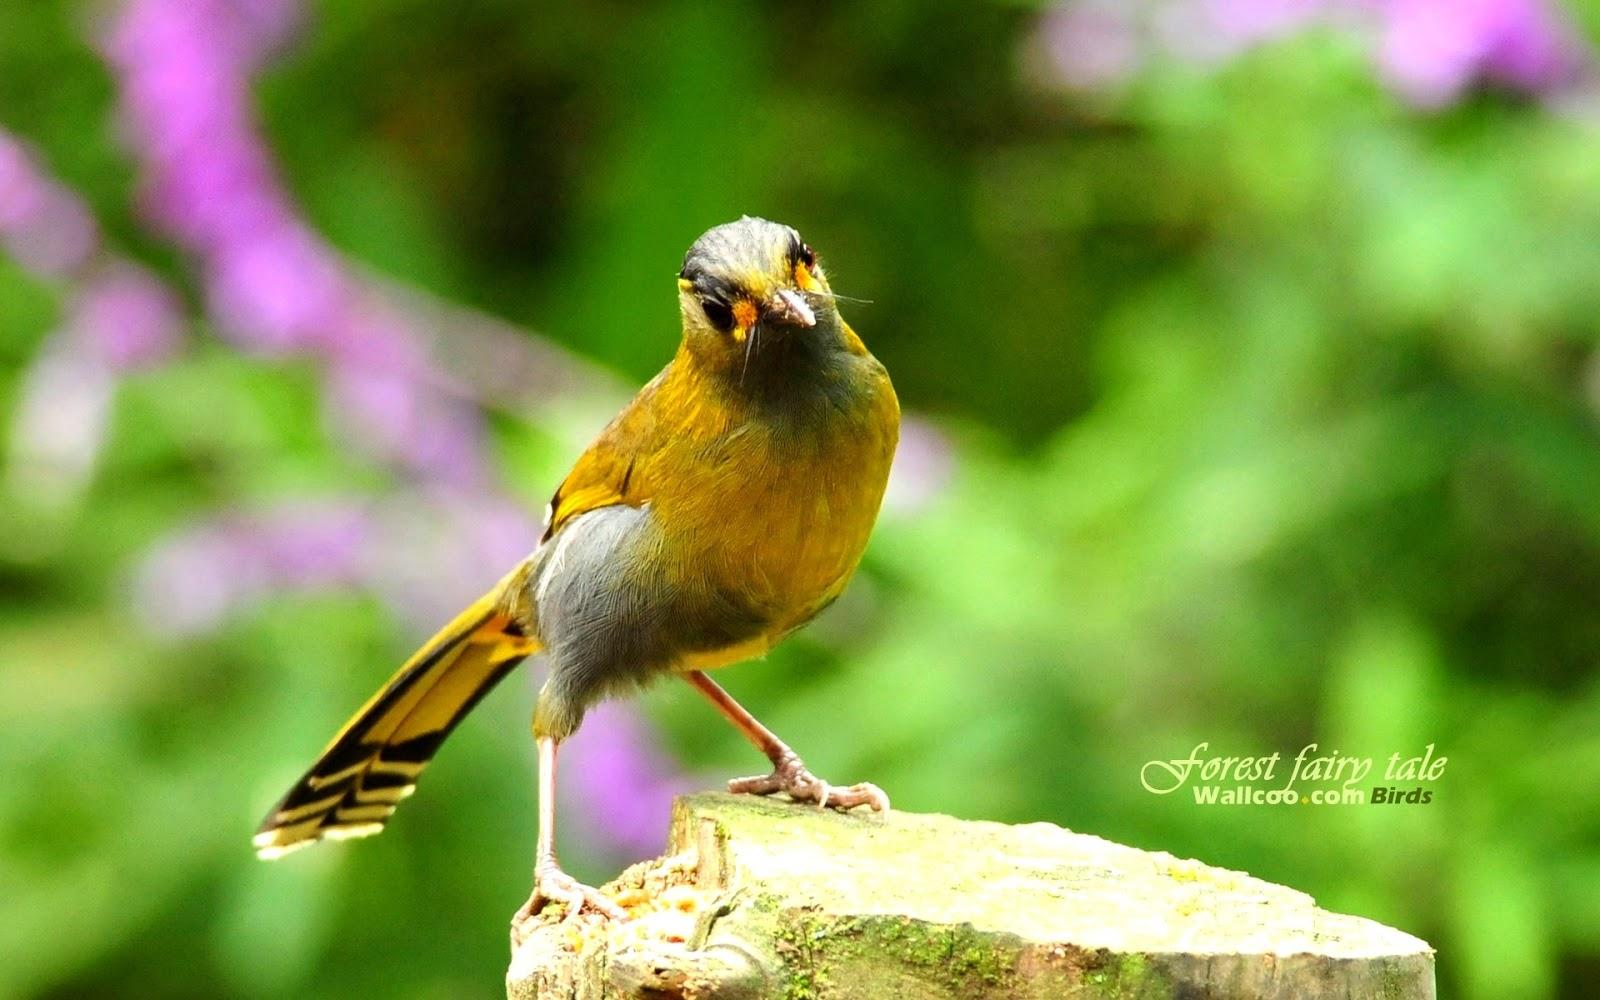 beautifulbirdswallpapers hddesktopwallpapers birdsimages birds 1600x1000